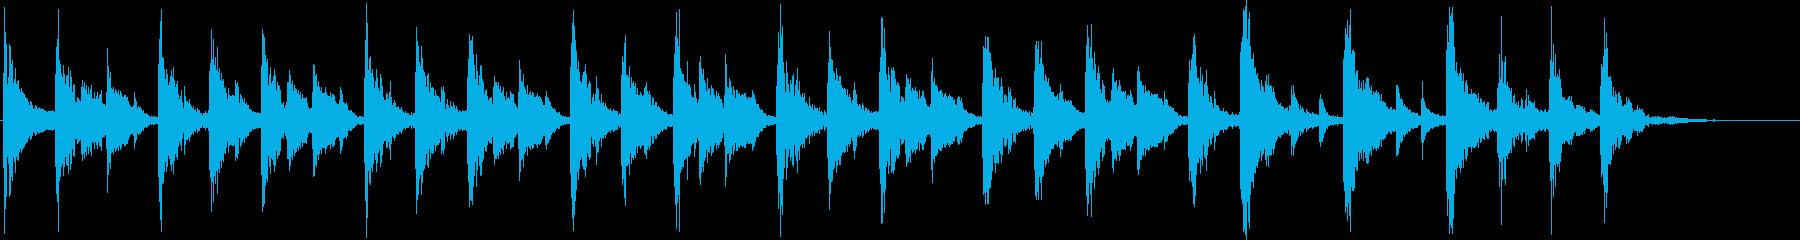 Comical jingle with light rhythm's reproduced waveform